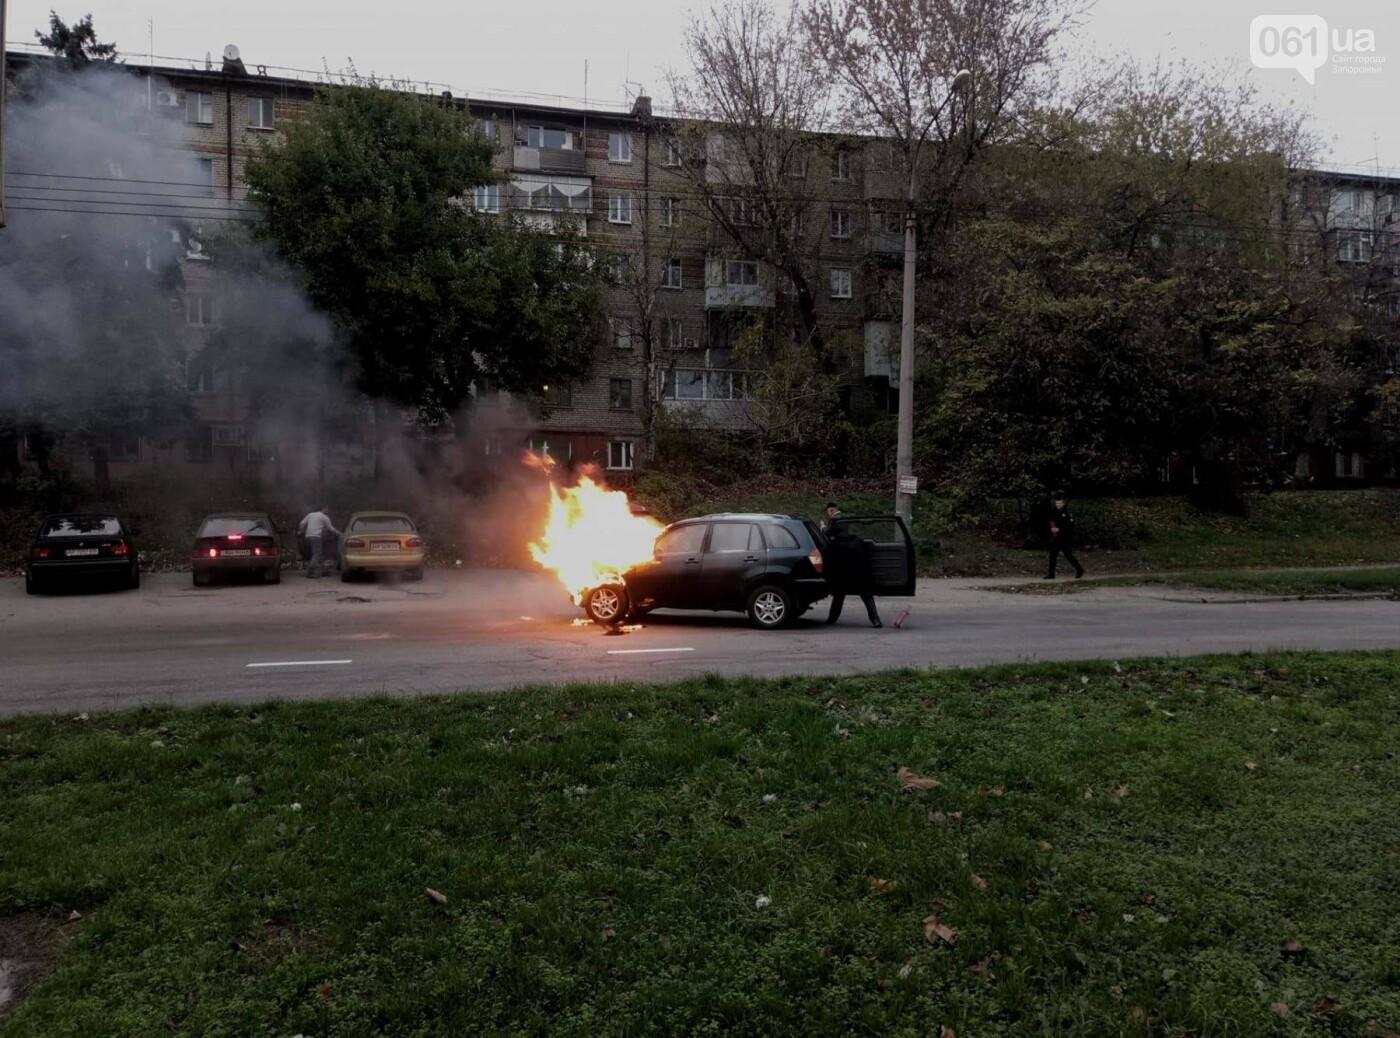 В Запорожье посреди дороги загорелся автомобиль, - ФОТО , фото-4